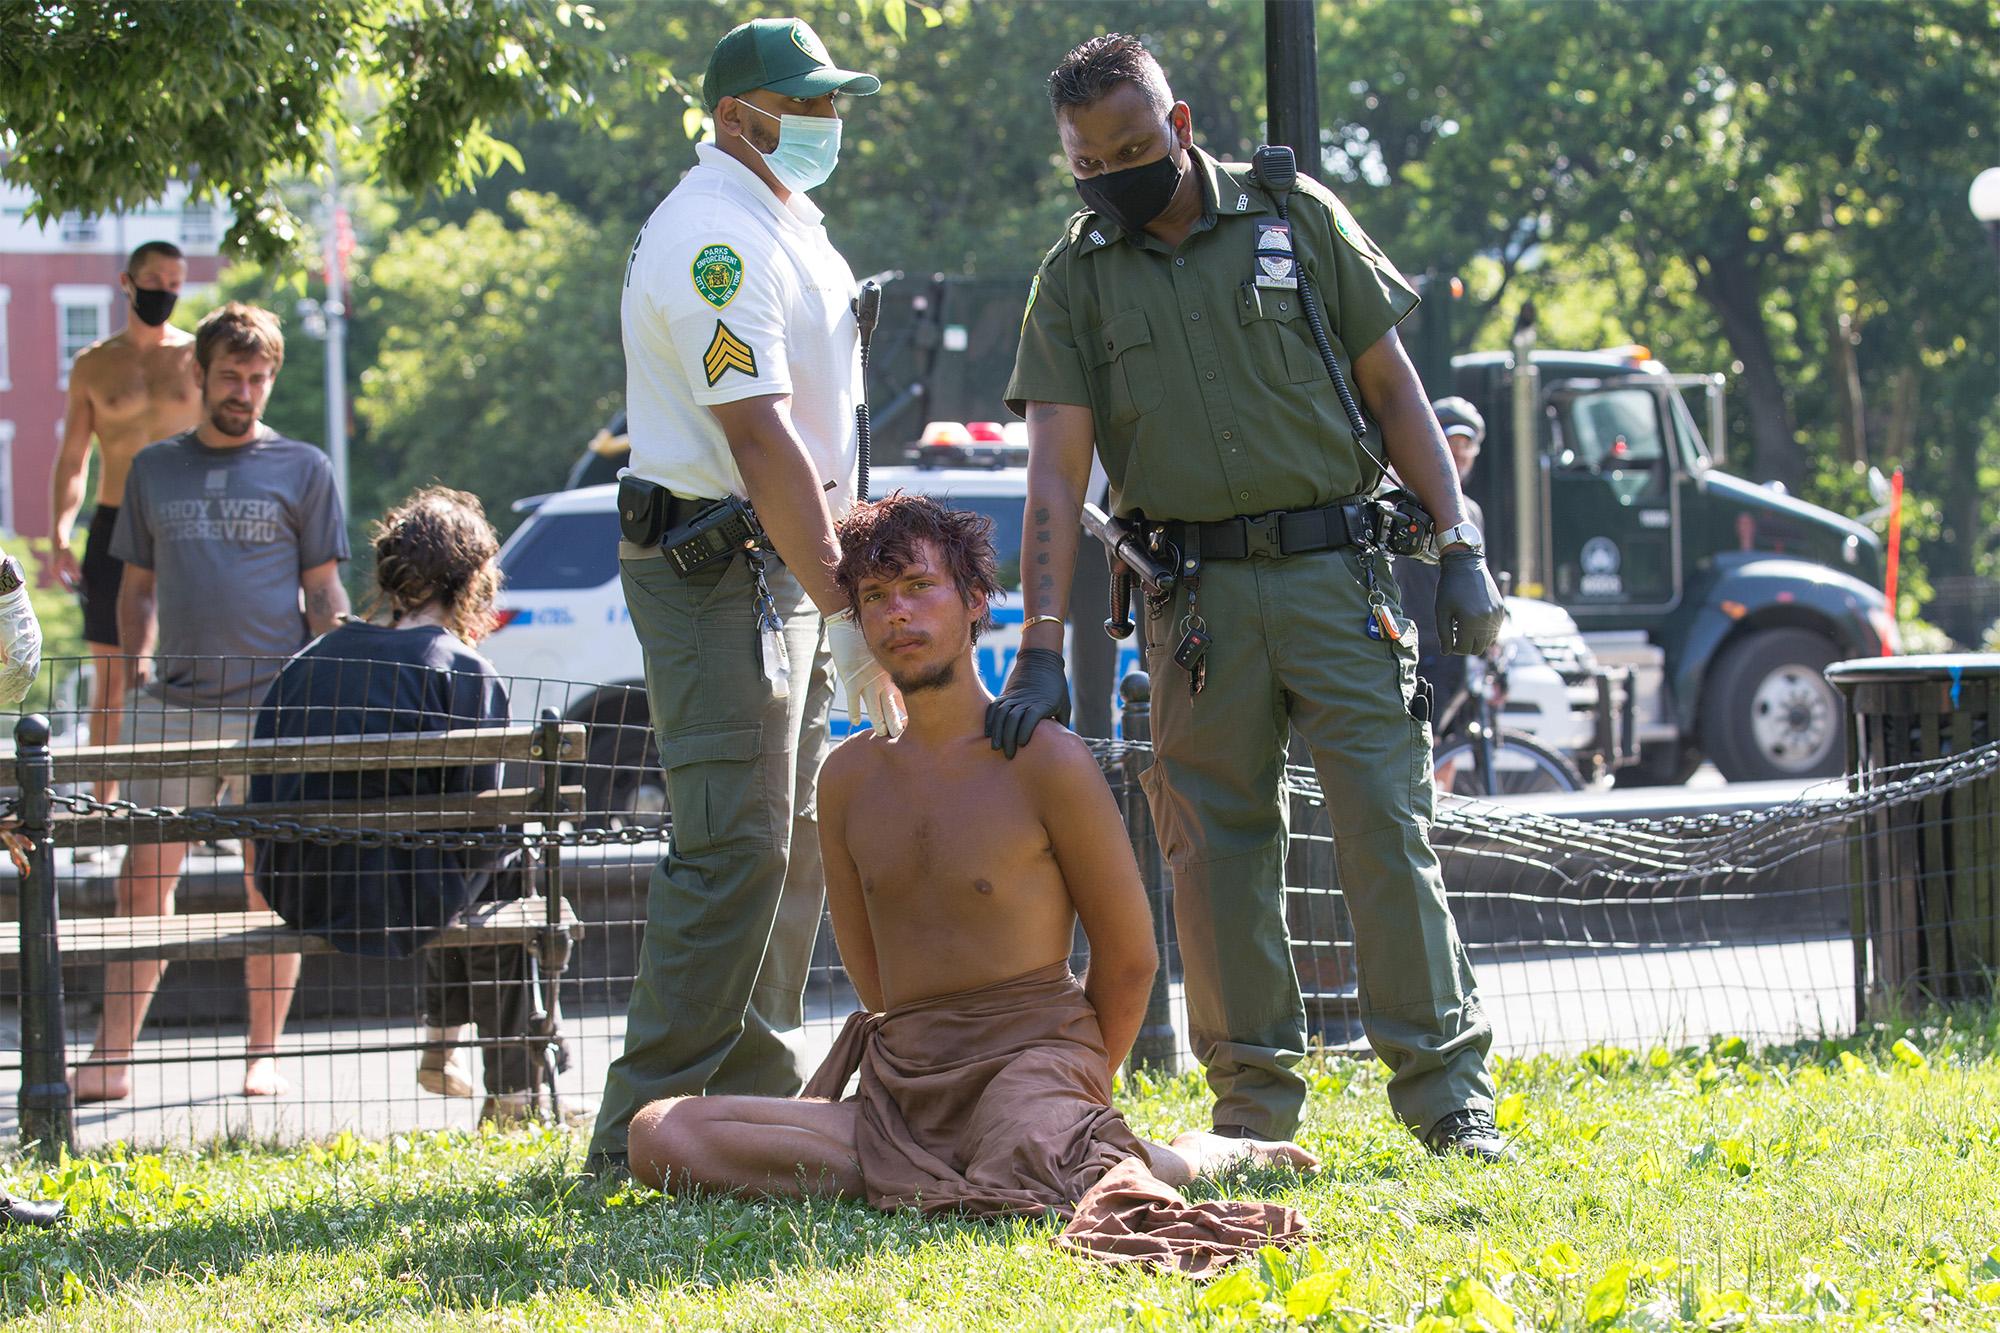 Washington Square Parks squatting Jesus arrested after